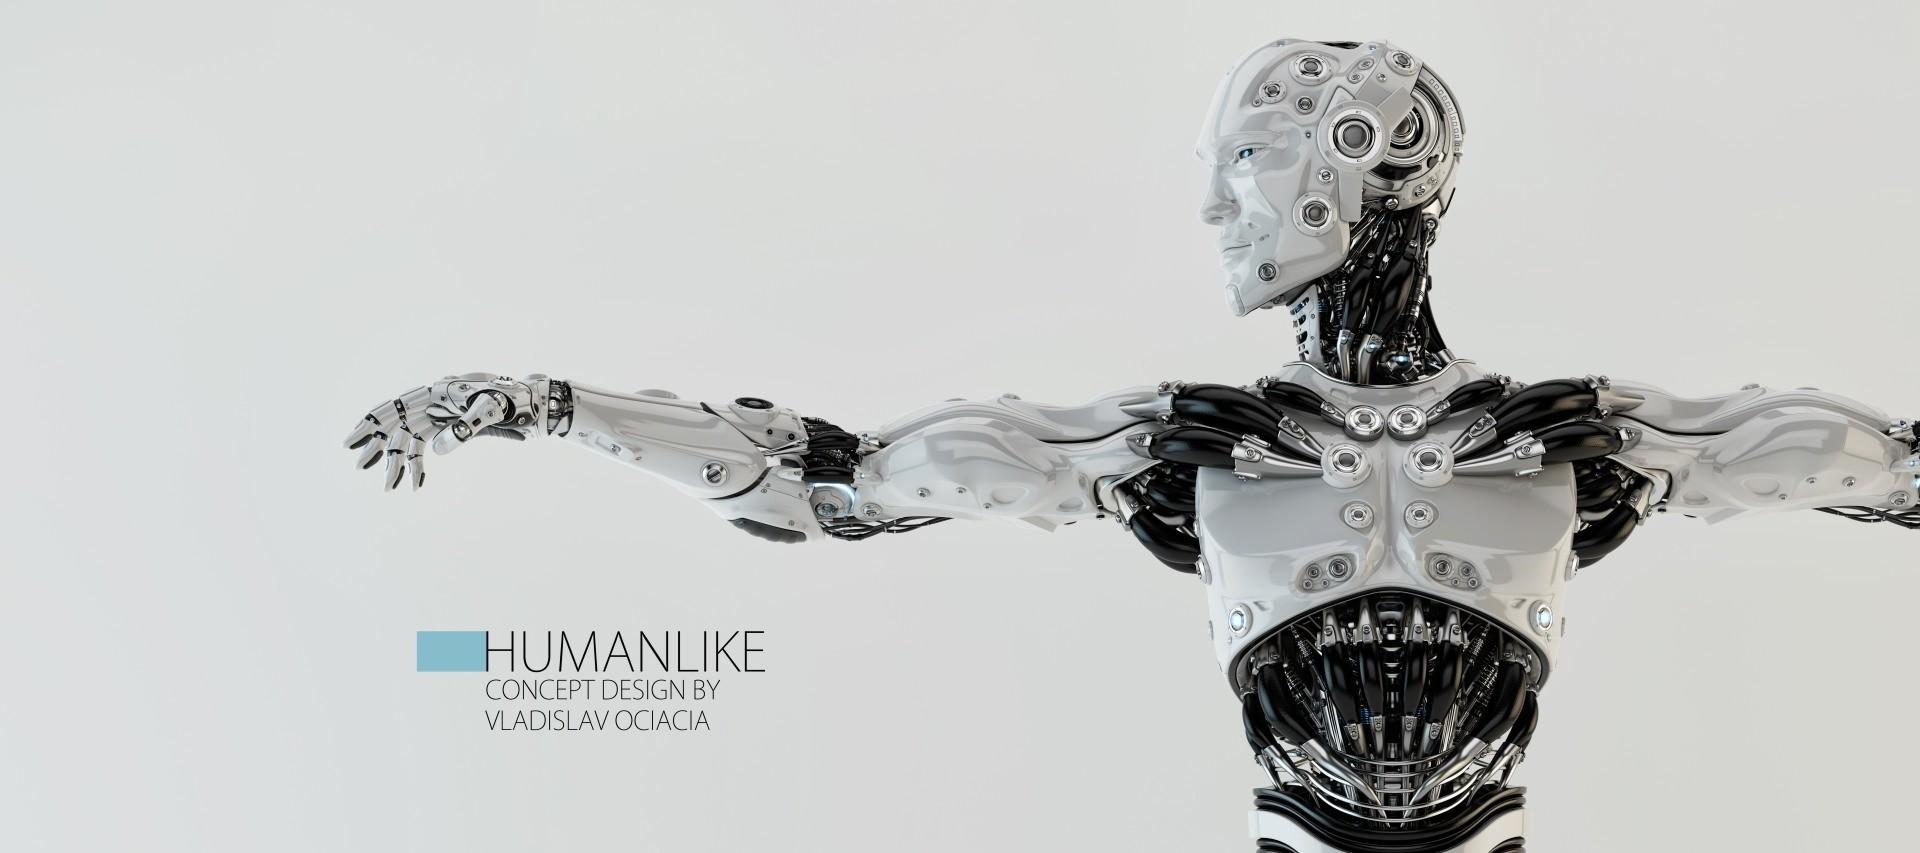 Vladislav ociacia robot humanlike 3